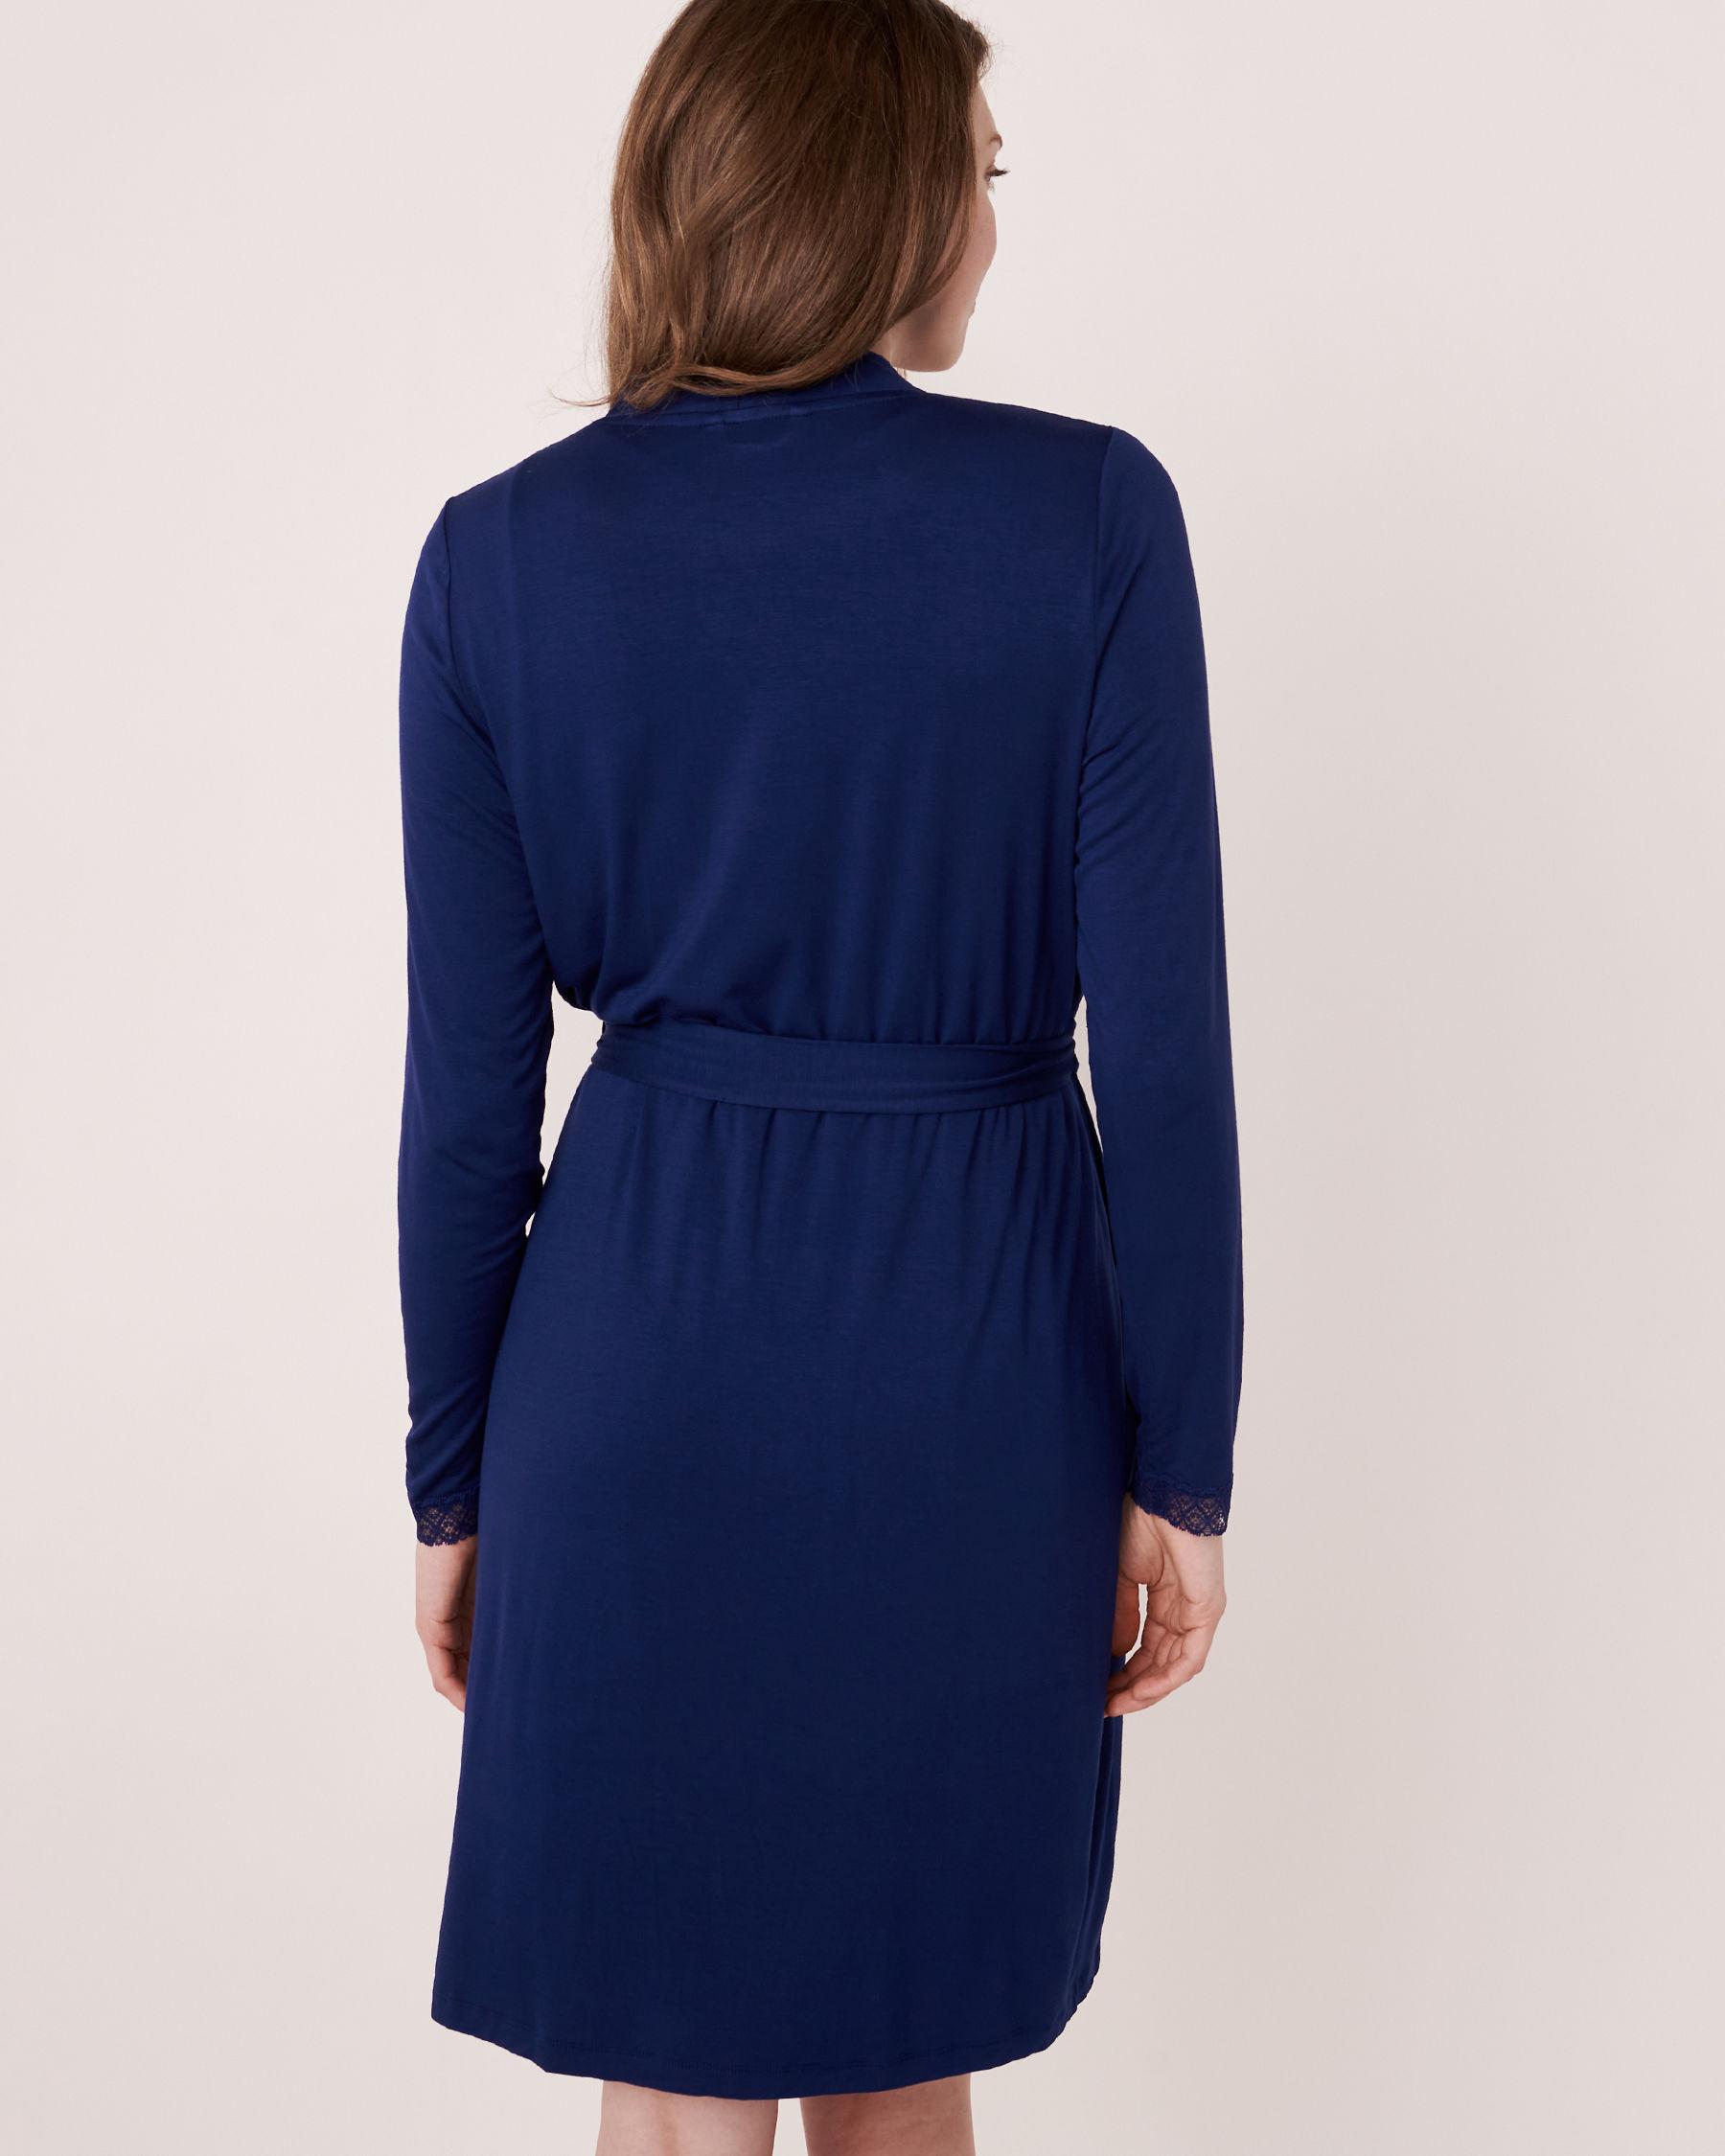 LA VIE EN ROSE Lace Trim Robe Blue 40600006 - View4